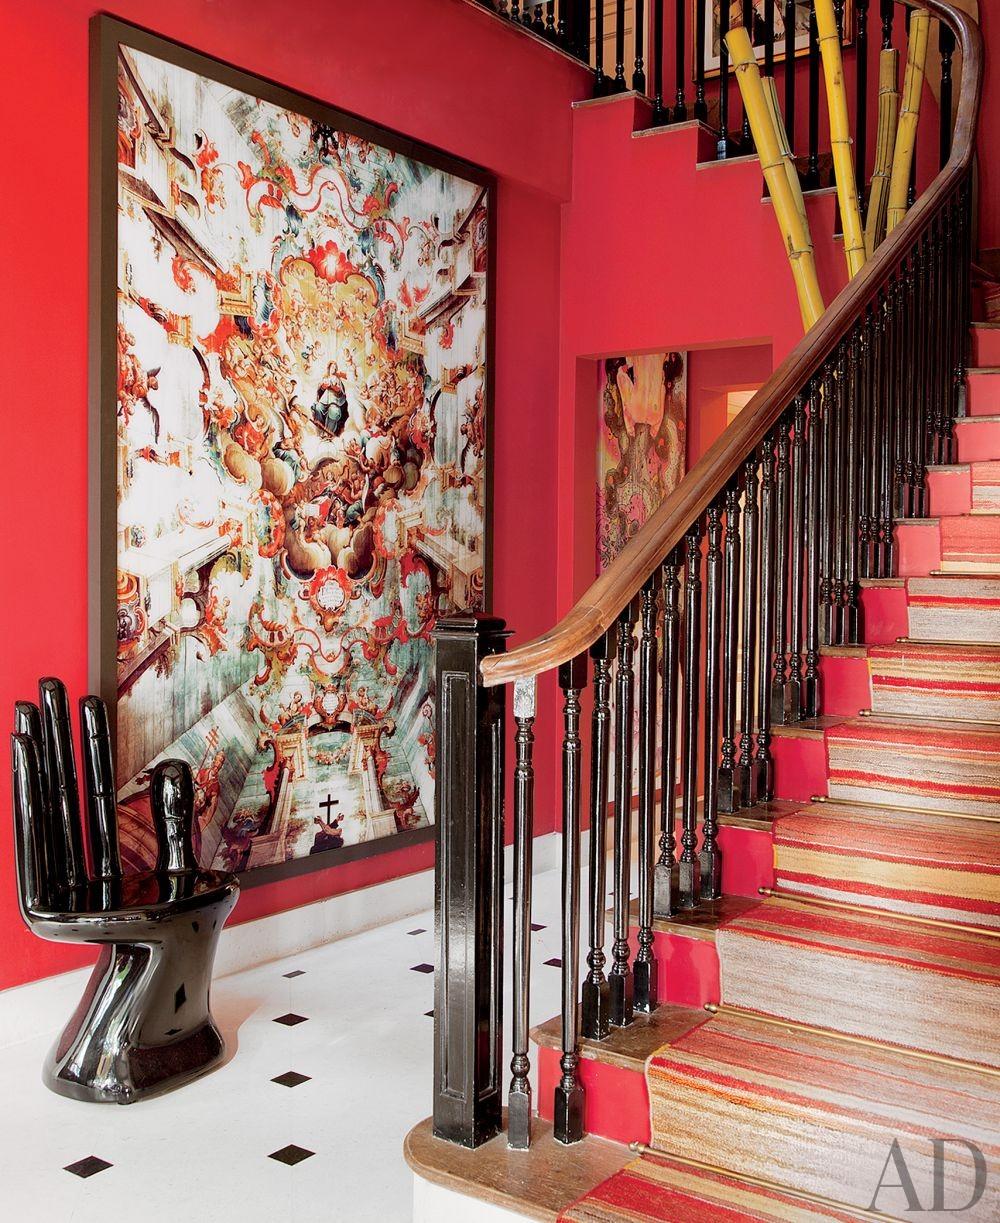 Exotic Entrance Hall by Sig Bergamin in São Paulo, Brazil